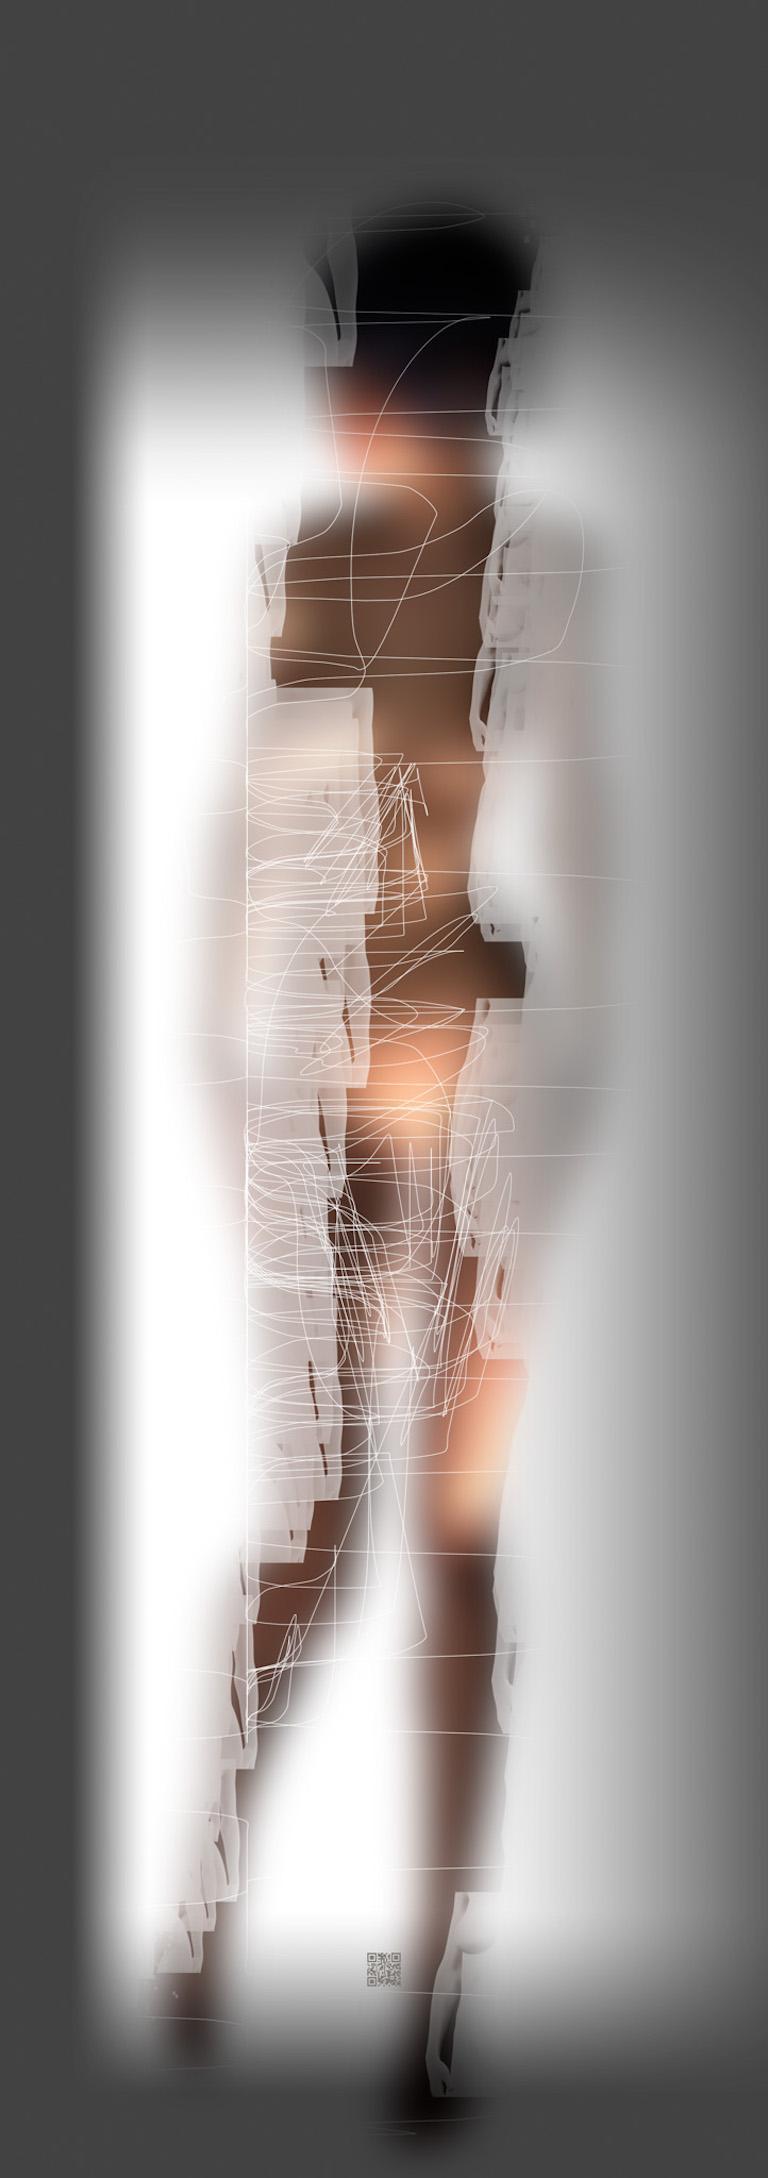 Gary Kaleda Nude - Oblique, digital painting of nude female, vertical